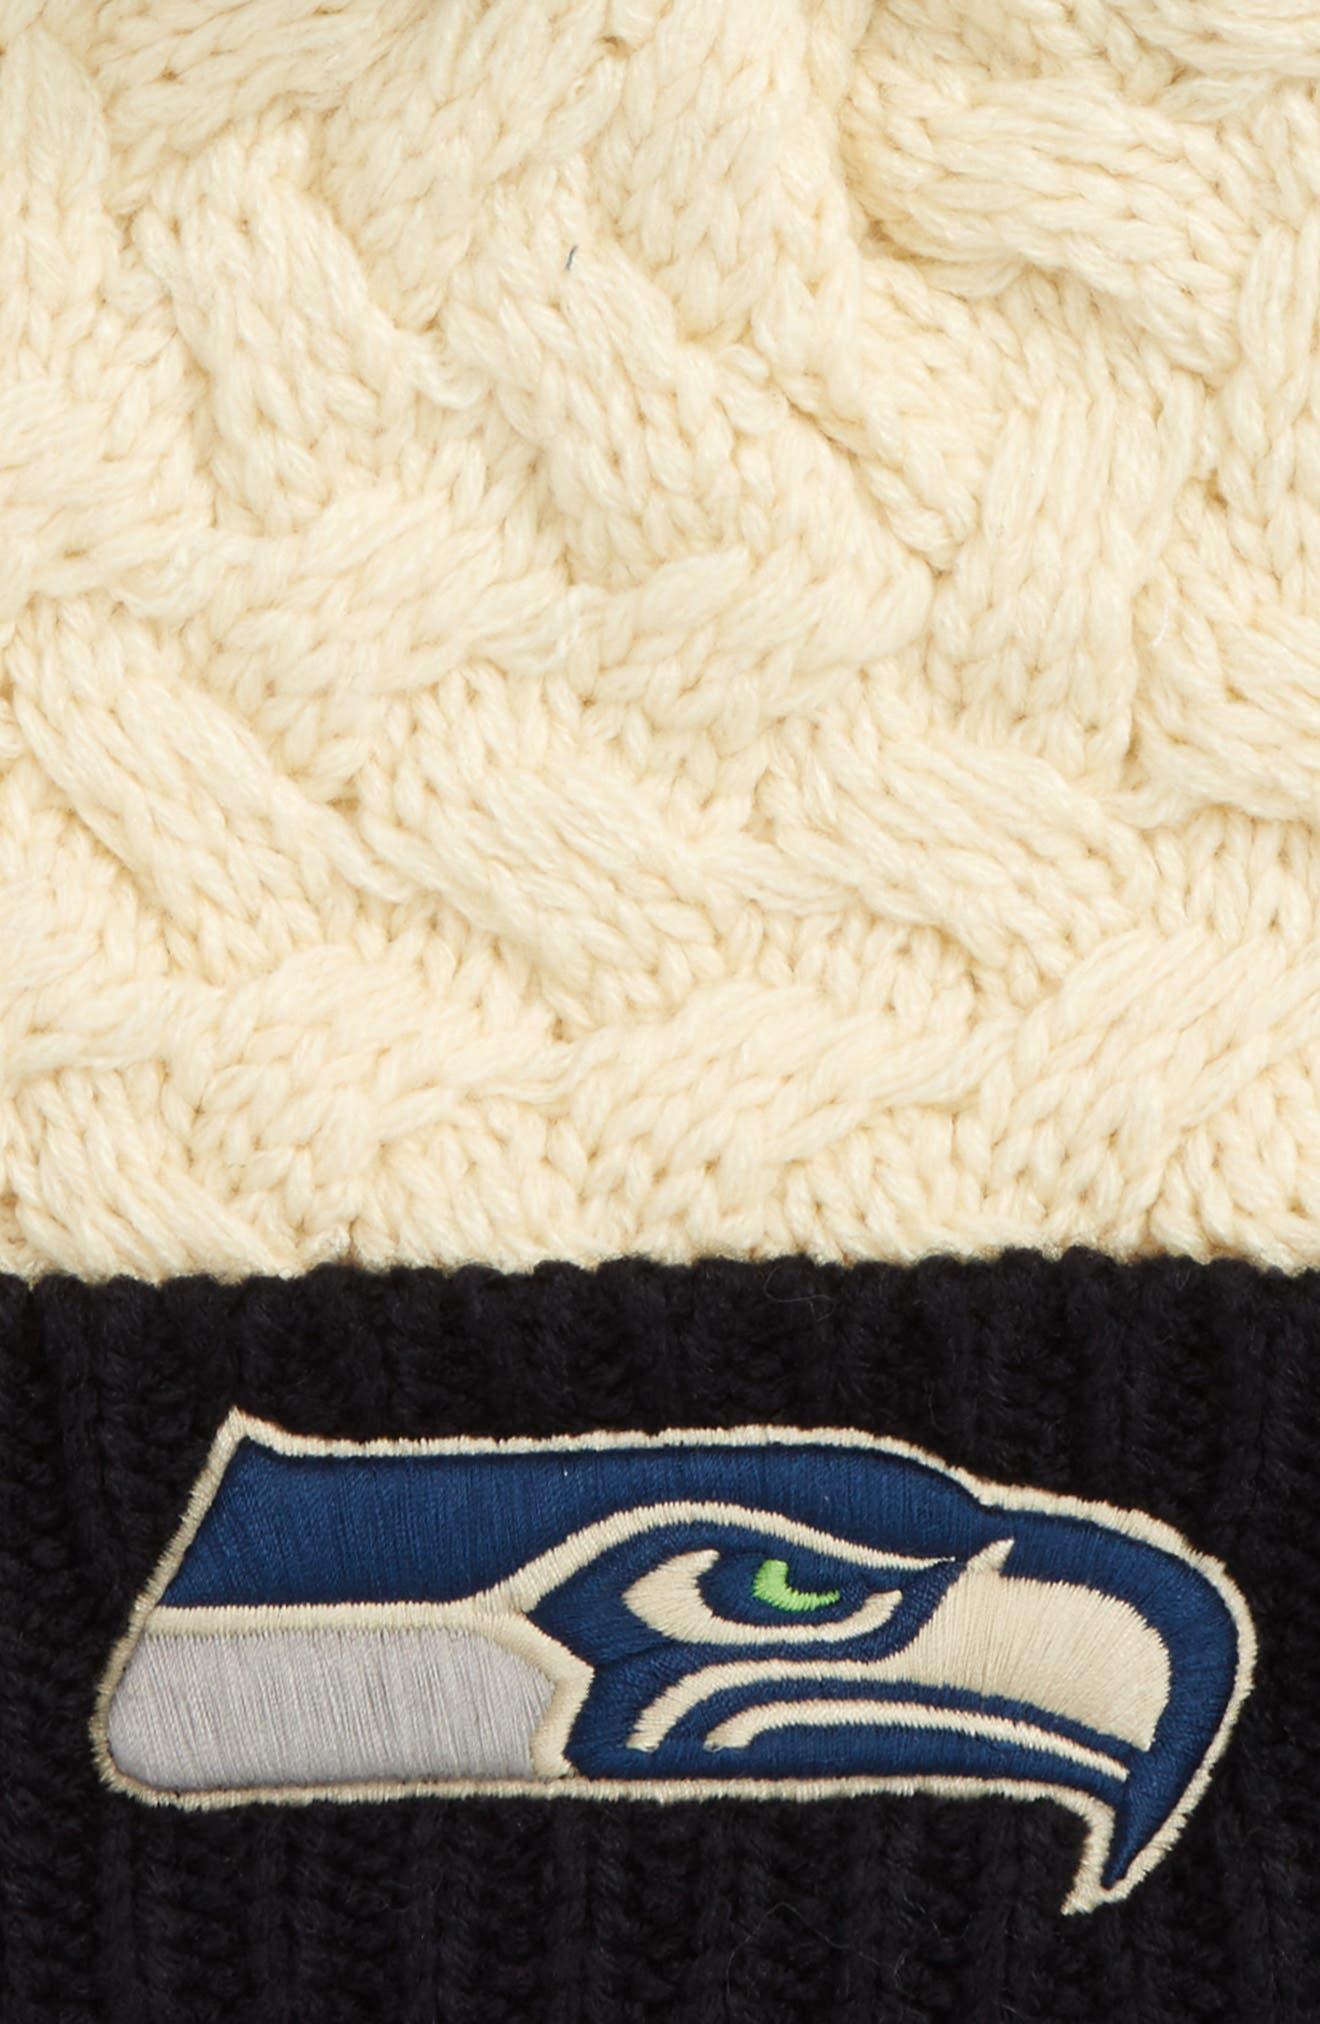 Matterhorn Seattle Seahawks Beanie,                             Alternate thumbnail 2, color,                             110